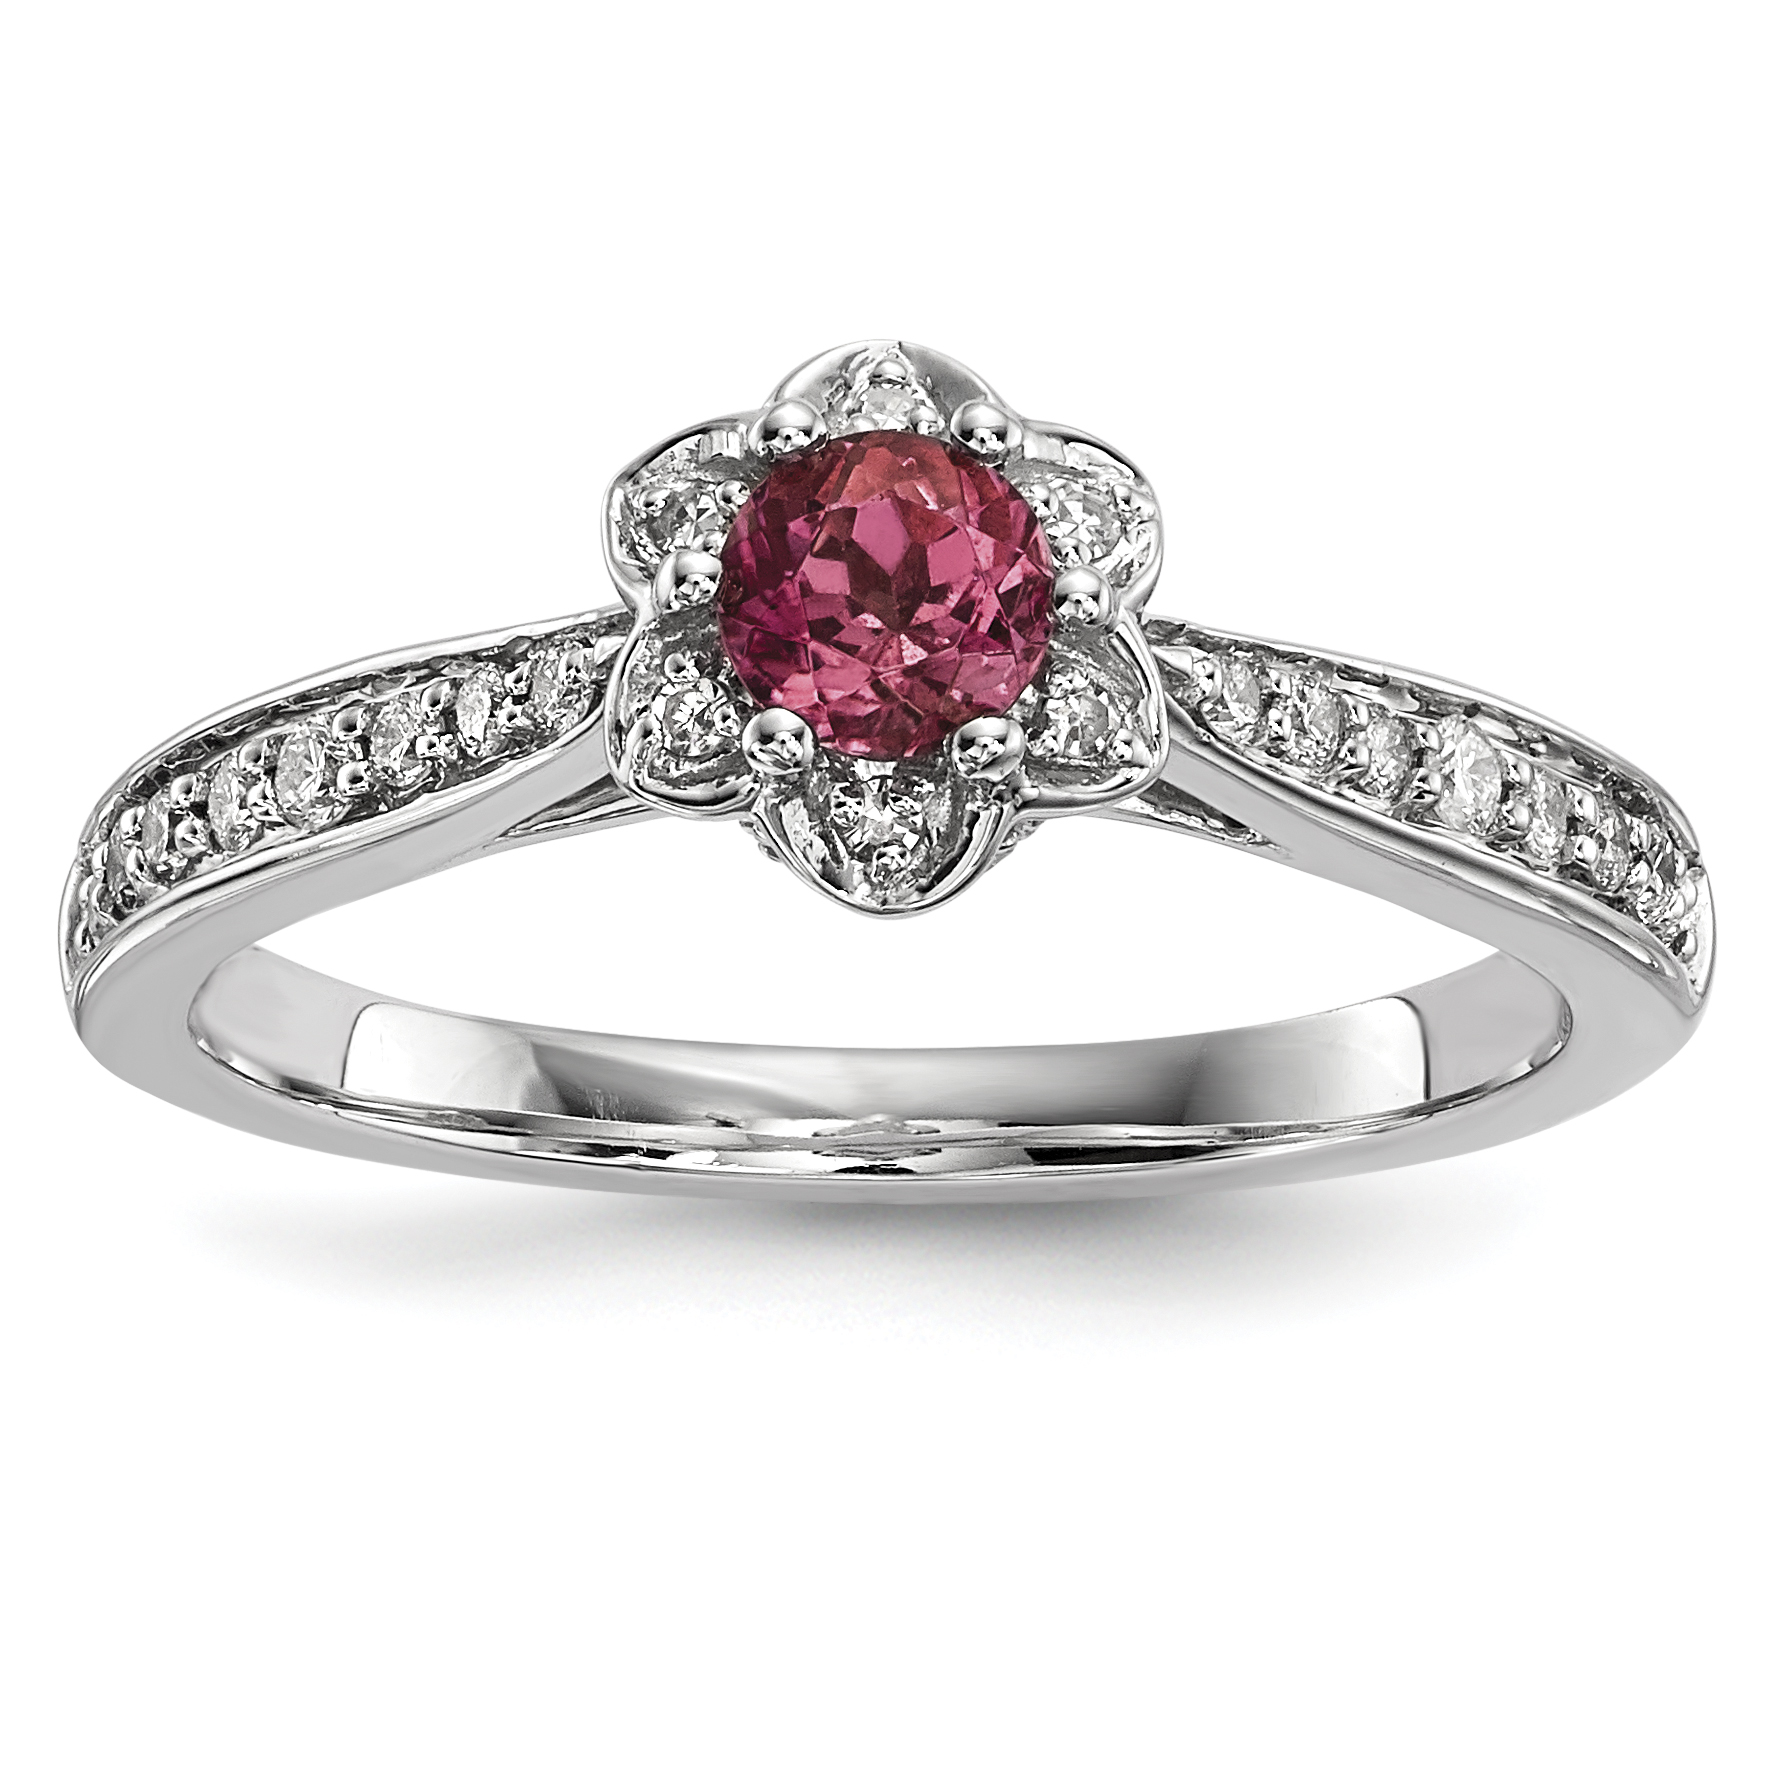 14k White Gold Diamond & Pink Tourmaline Ring Size by